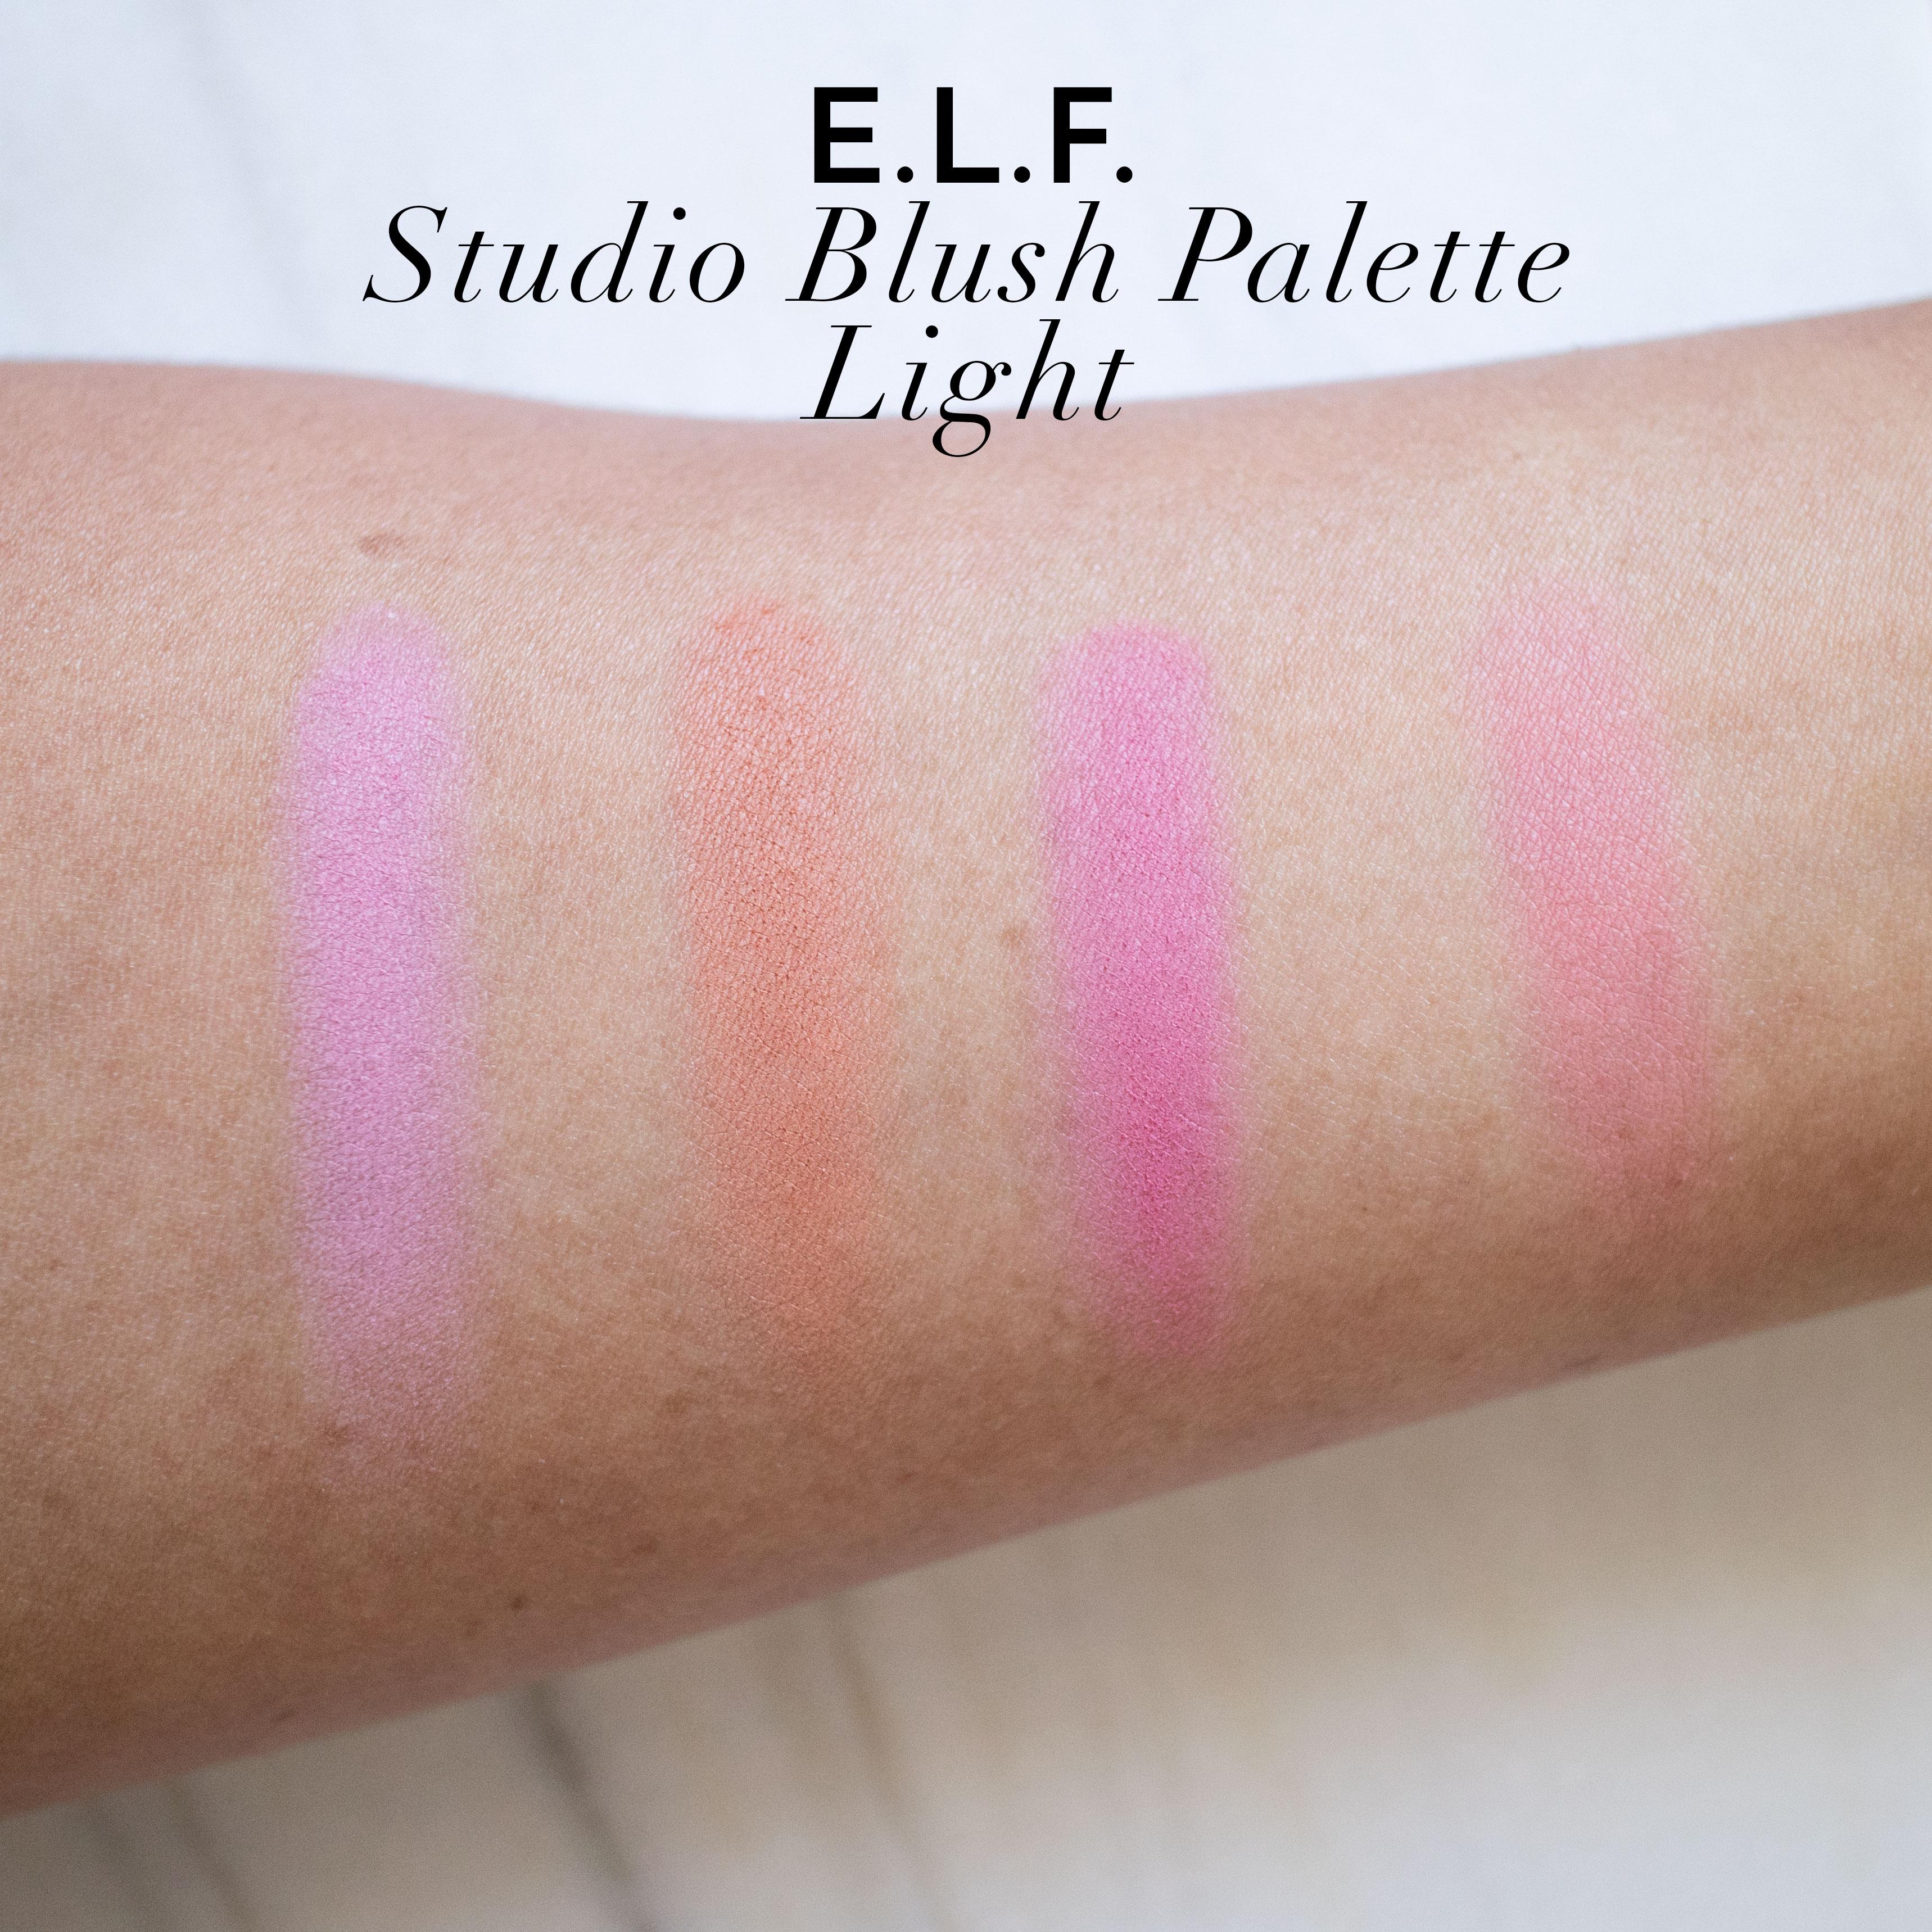 Studio Blush Palette - Light by e.l.f. #10